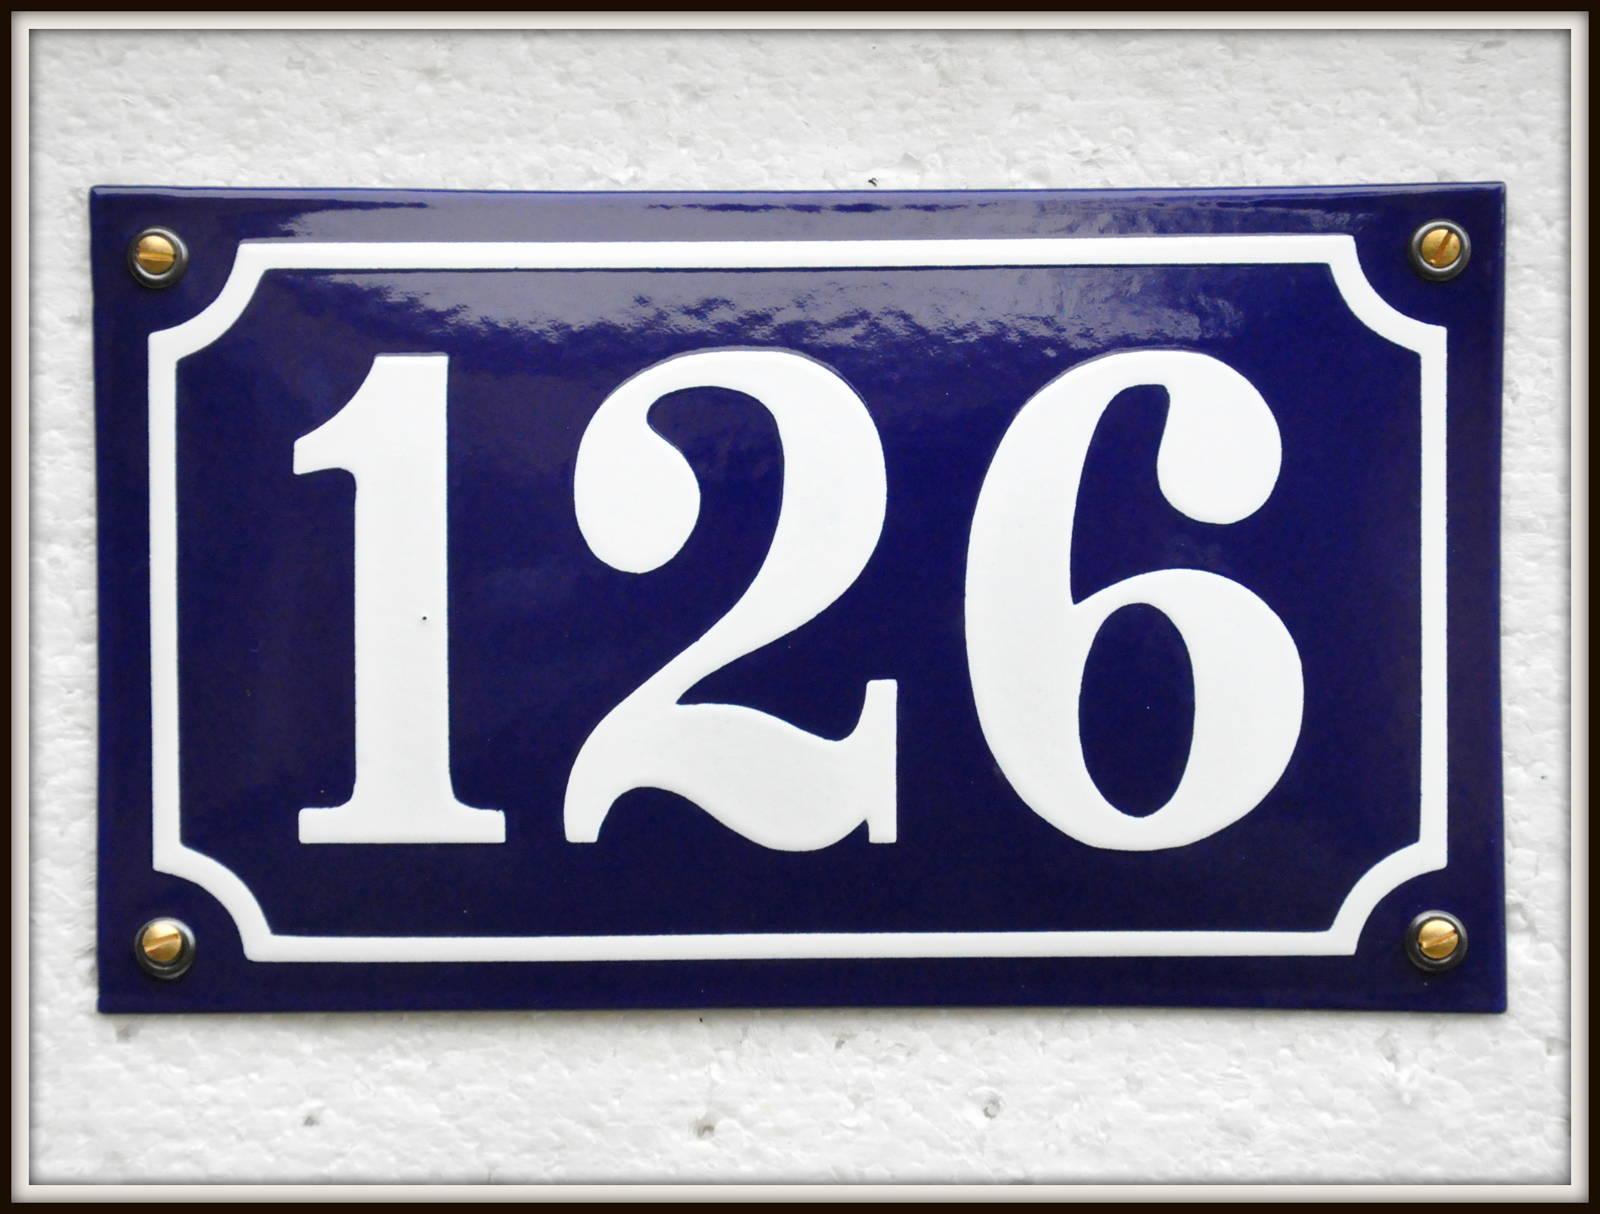 170×100 Mm, Blå/Hvid, På Lager Nr. 100-200